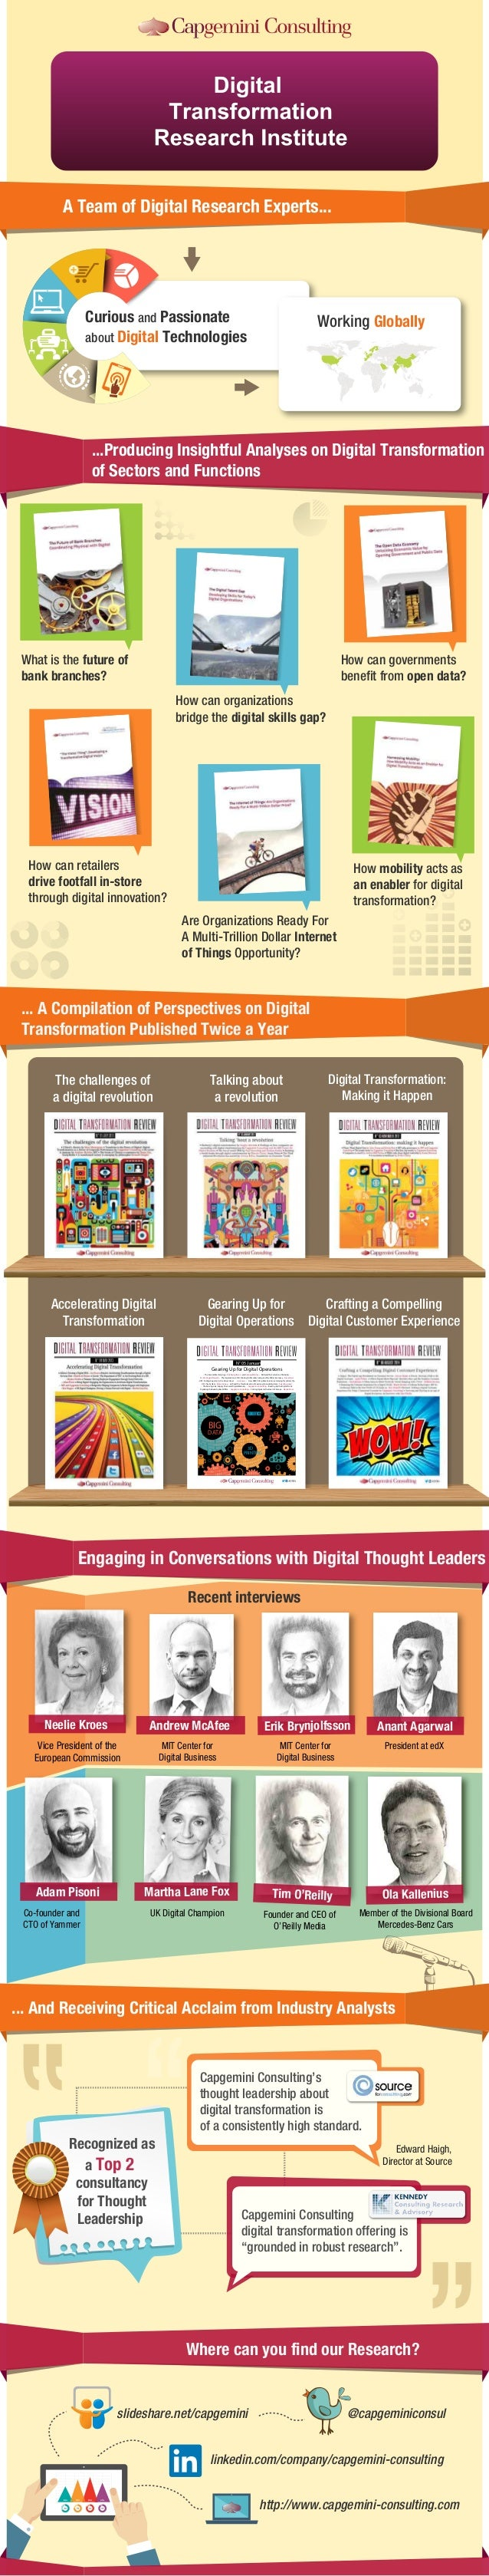 Digital Transformation Research Institute: A Team of Digital Research Experts